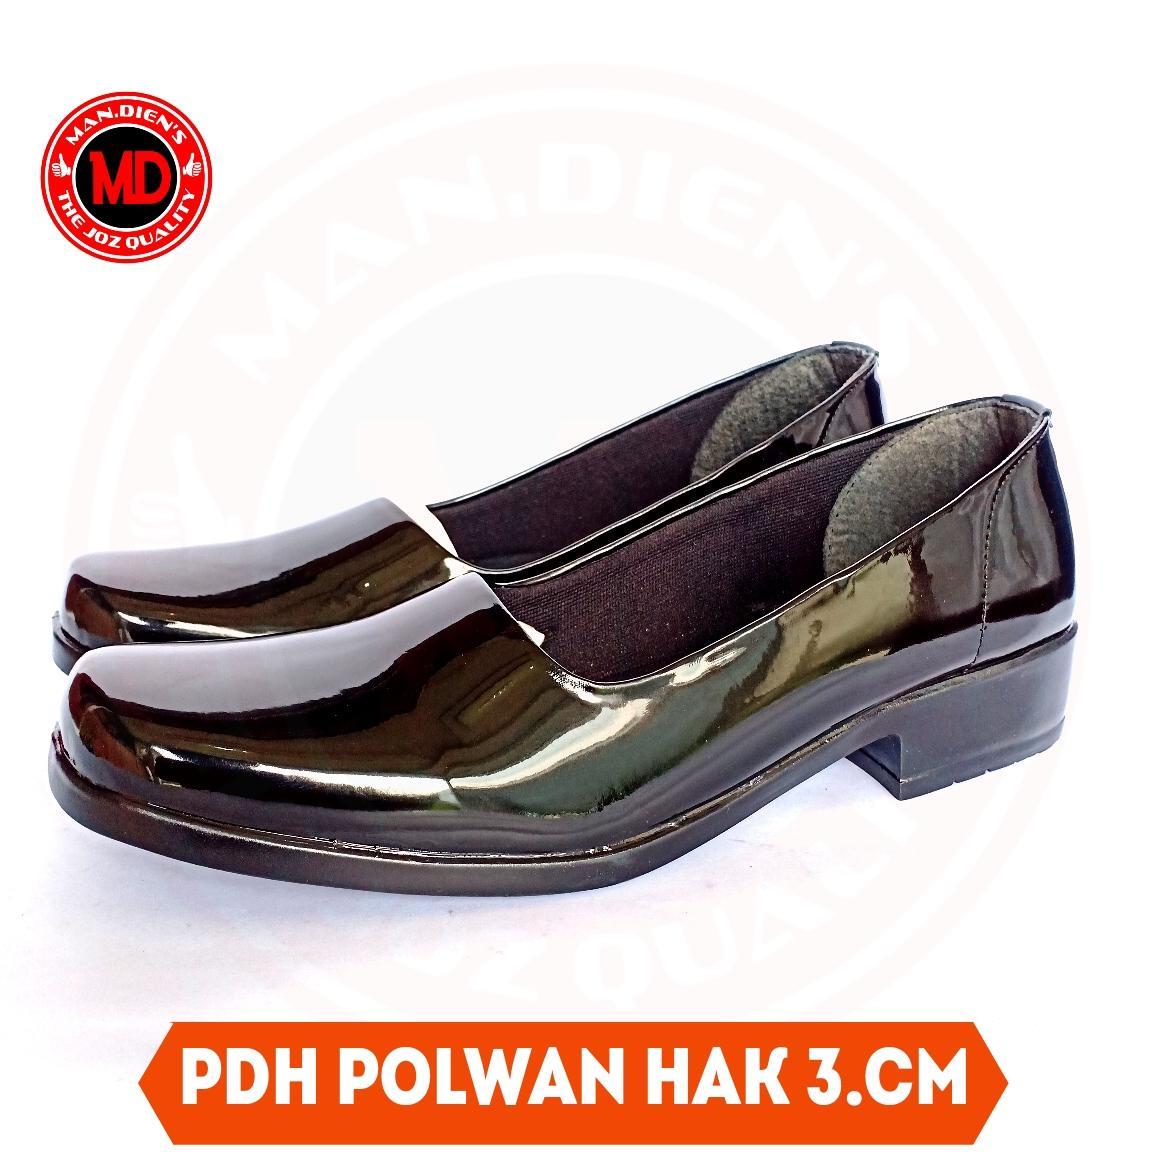 mandiens pdh polwan kilap 3cm – sepatu wanita bayangkari – kowad – sepatu pns – sepatu psg – sepatu psk – sepatu psh